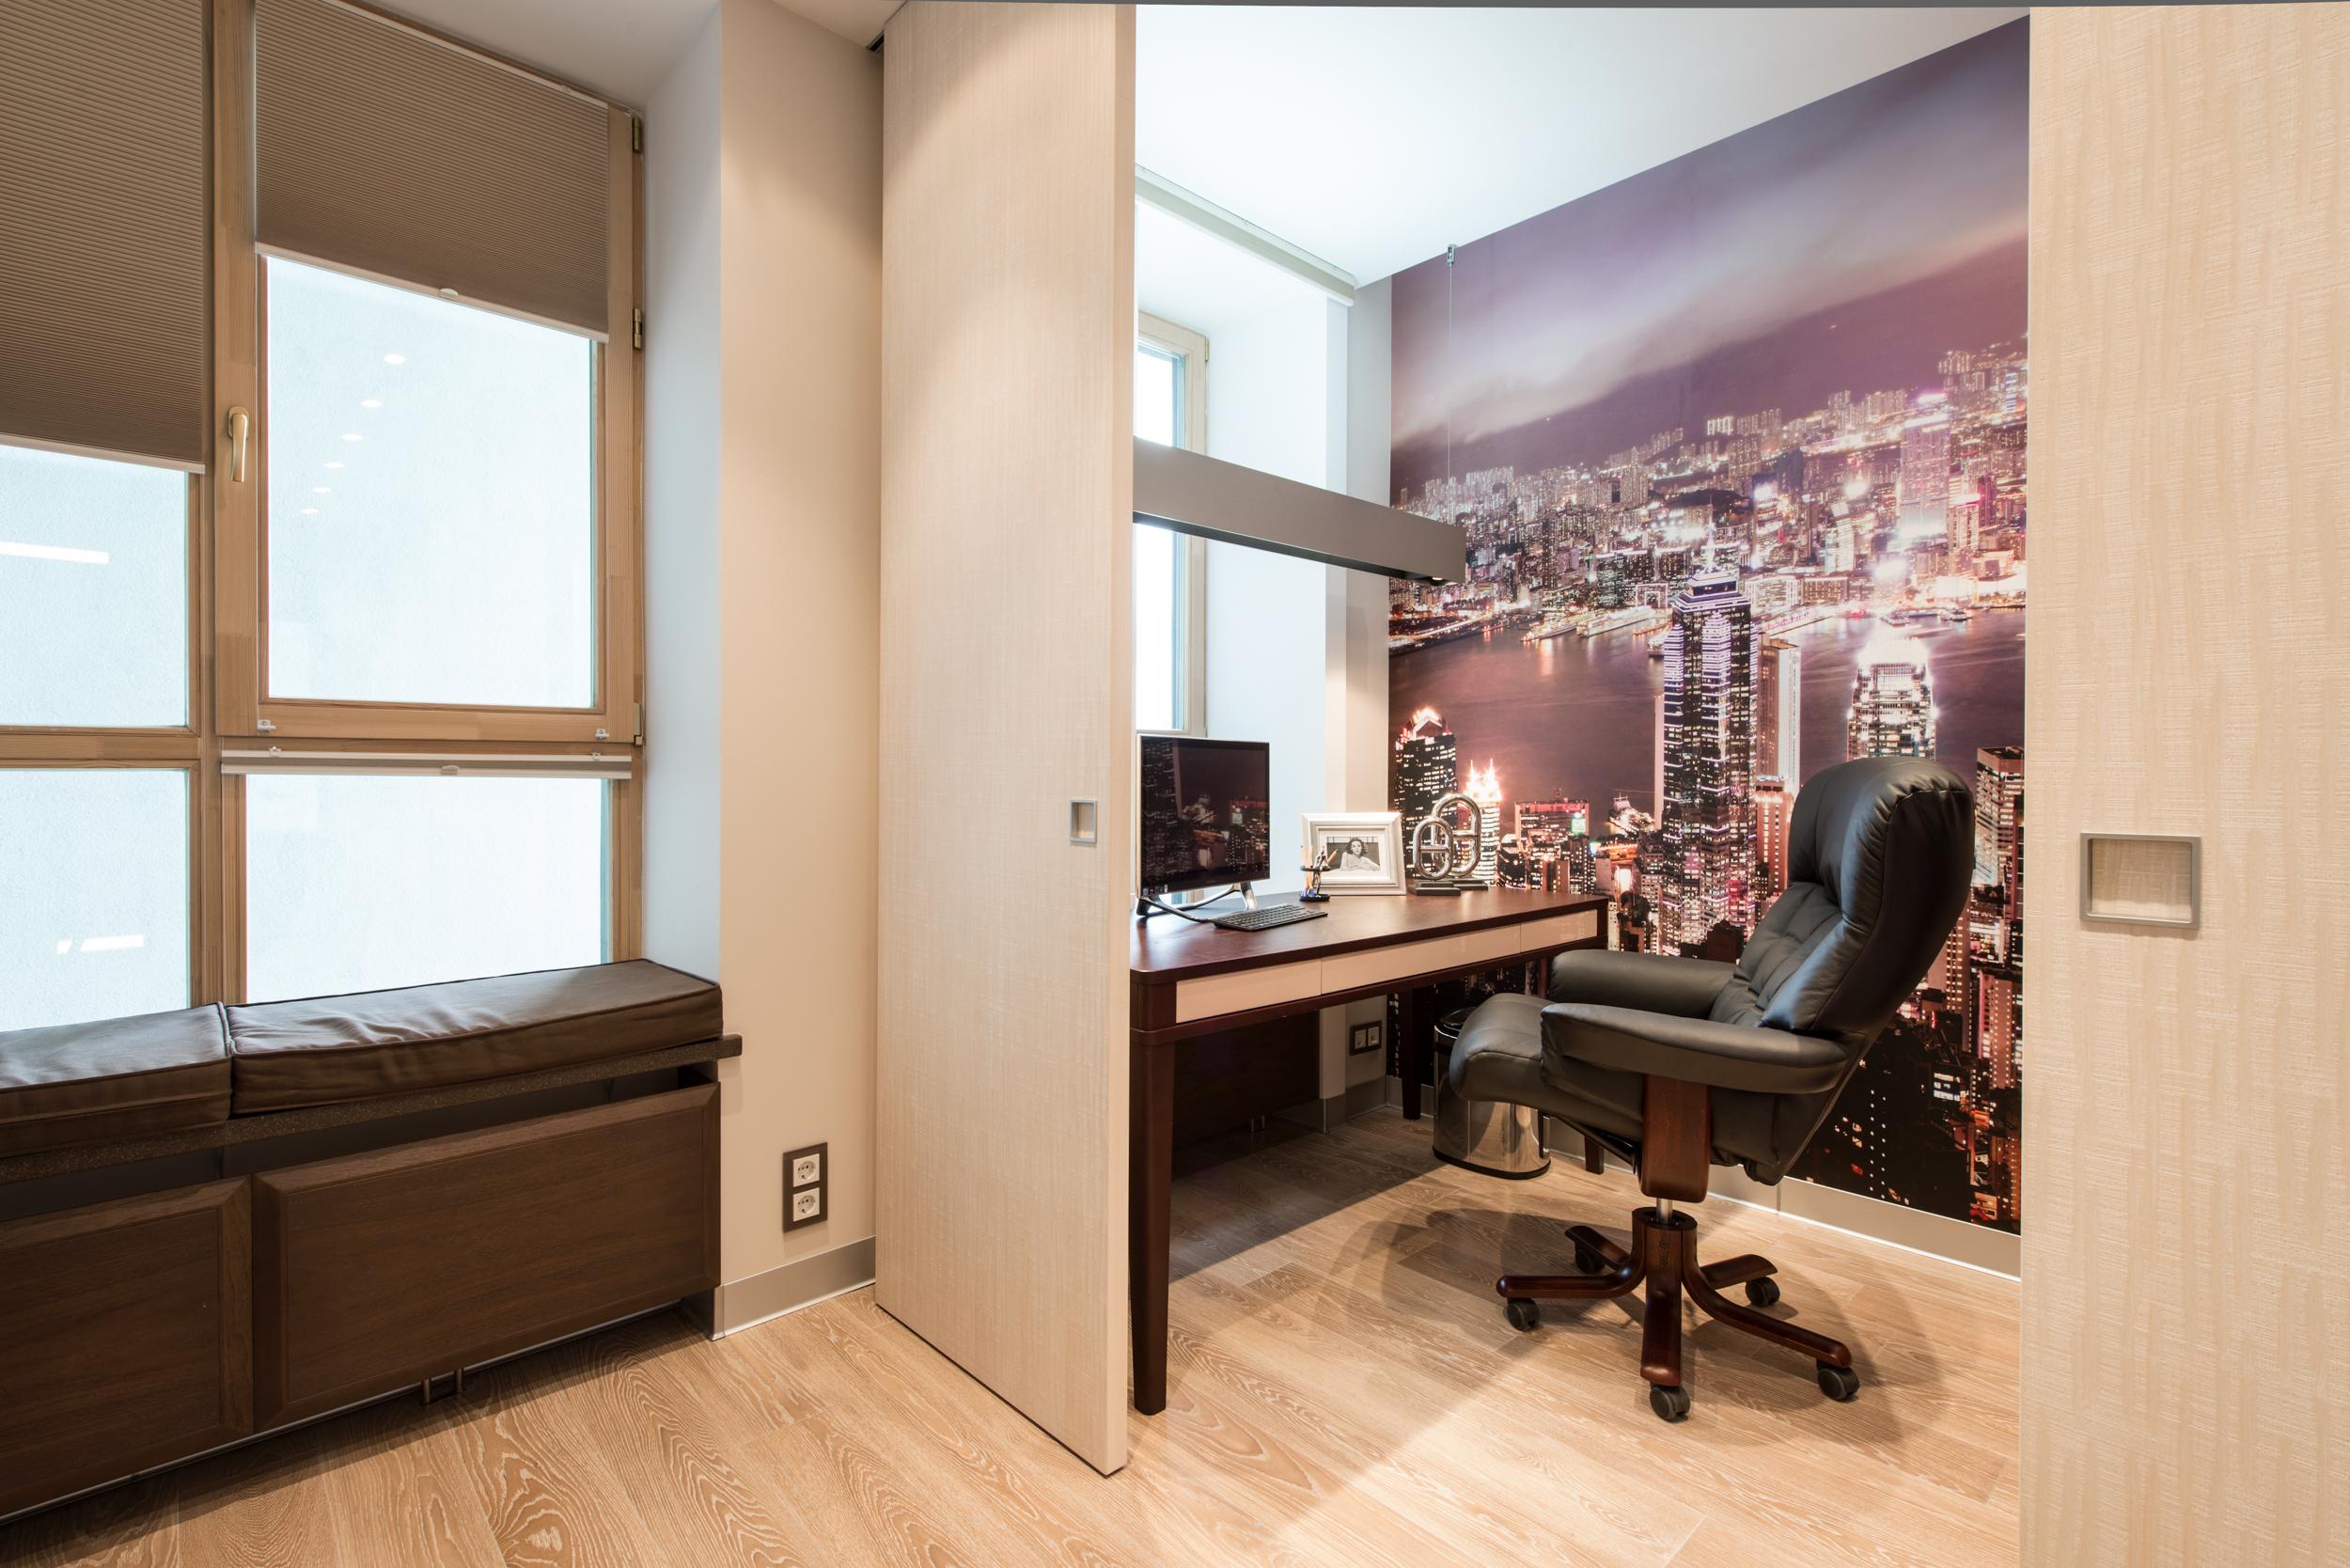 кабинет, дизайн интерьера, проект